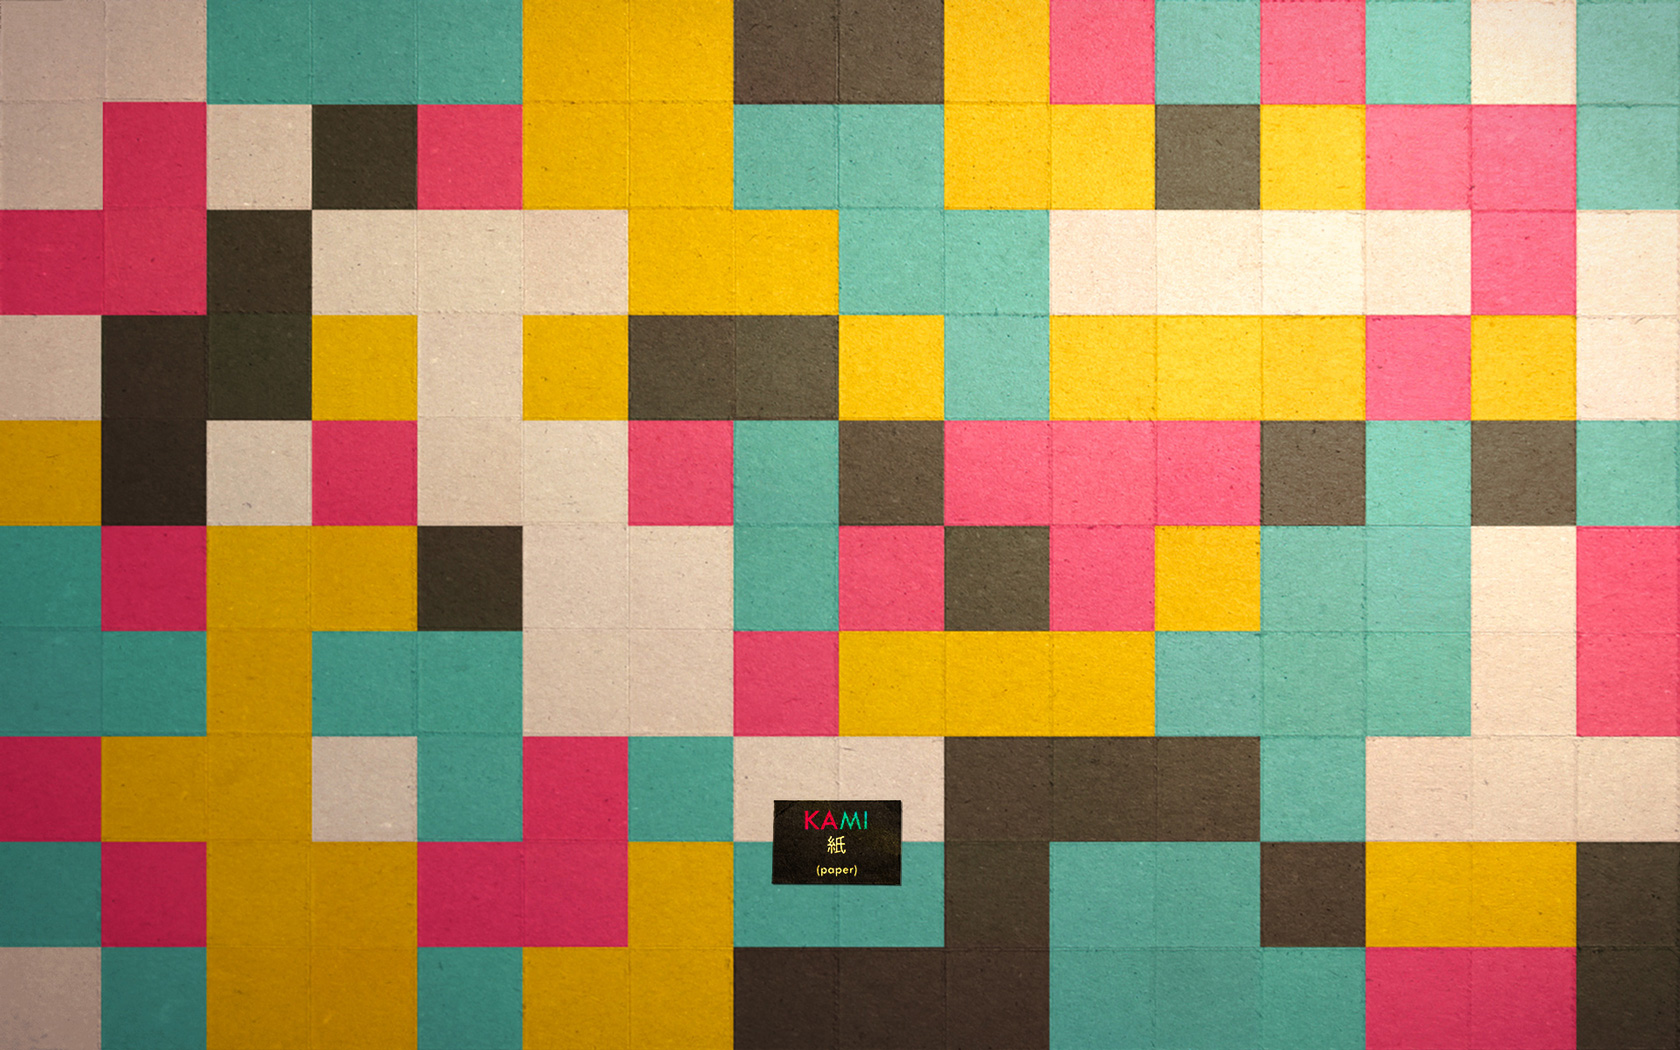 Free Kami Wallpaper in 1680x1050